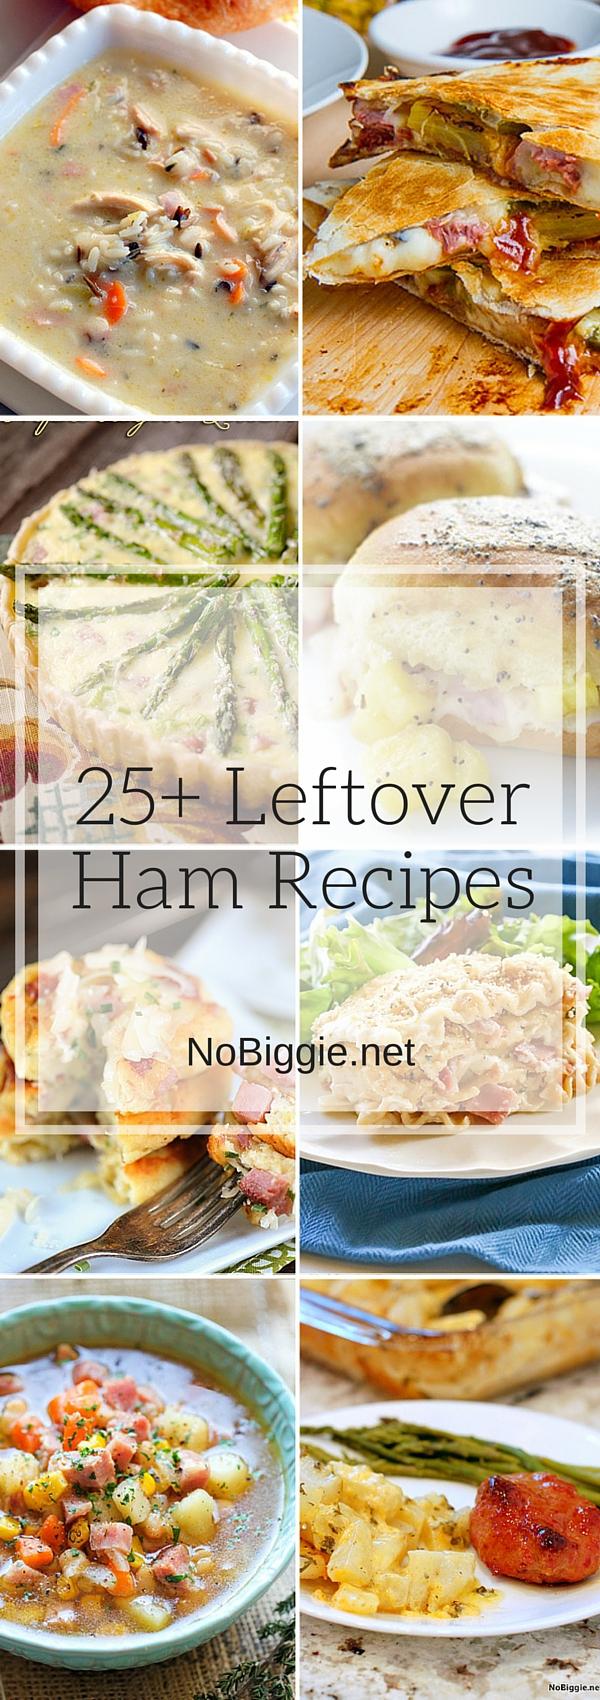 25+ Leftover Ham Recipes | NoBiggie.net